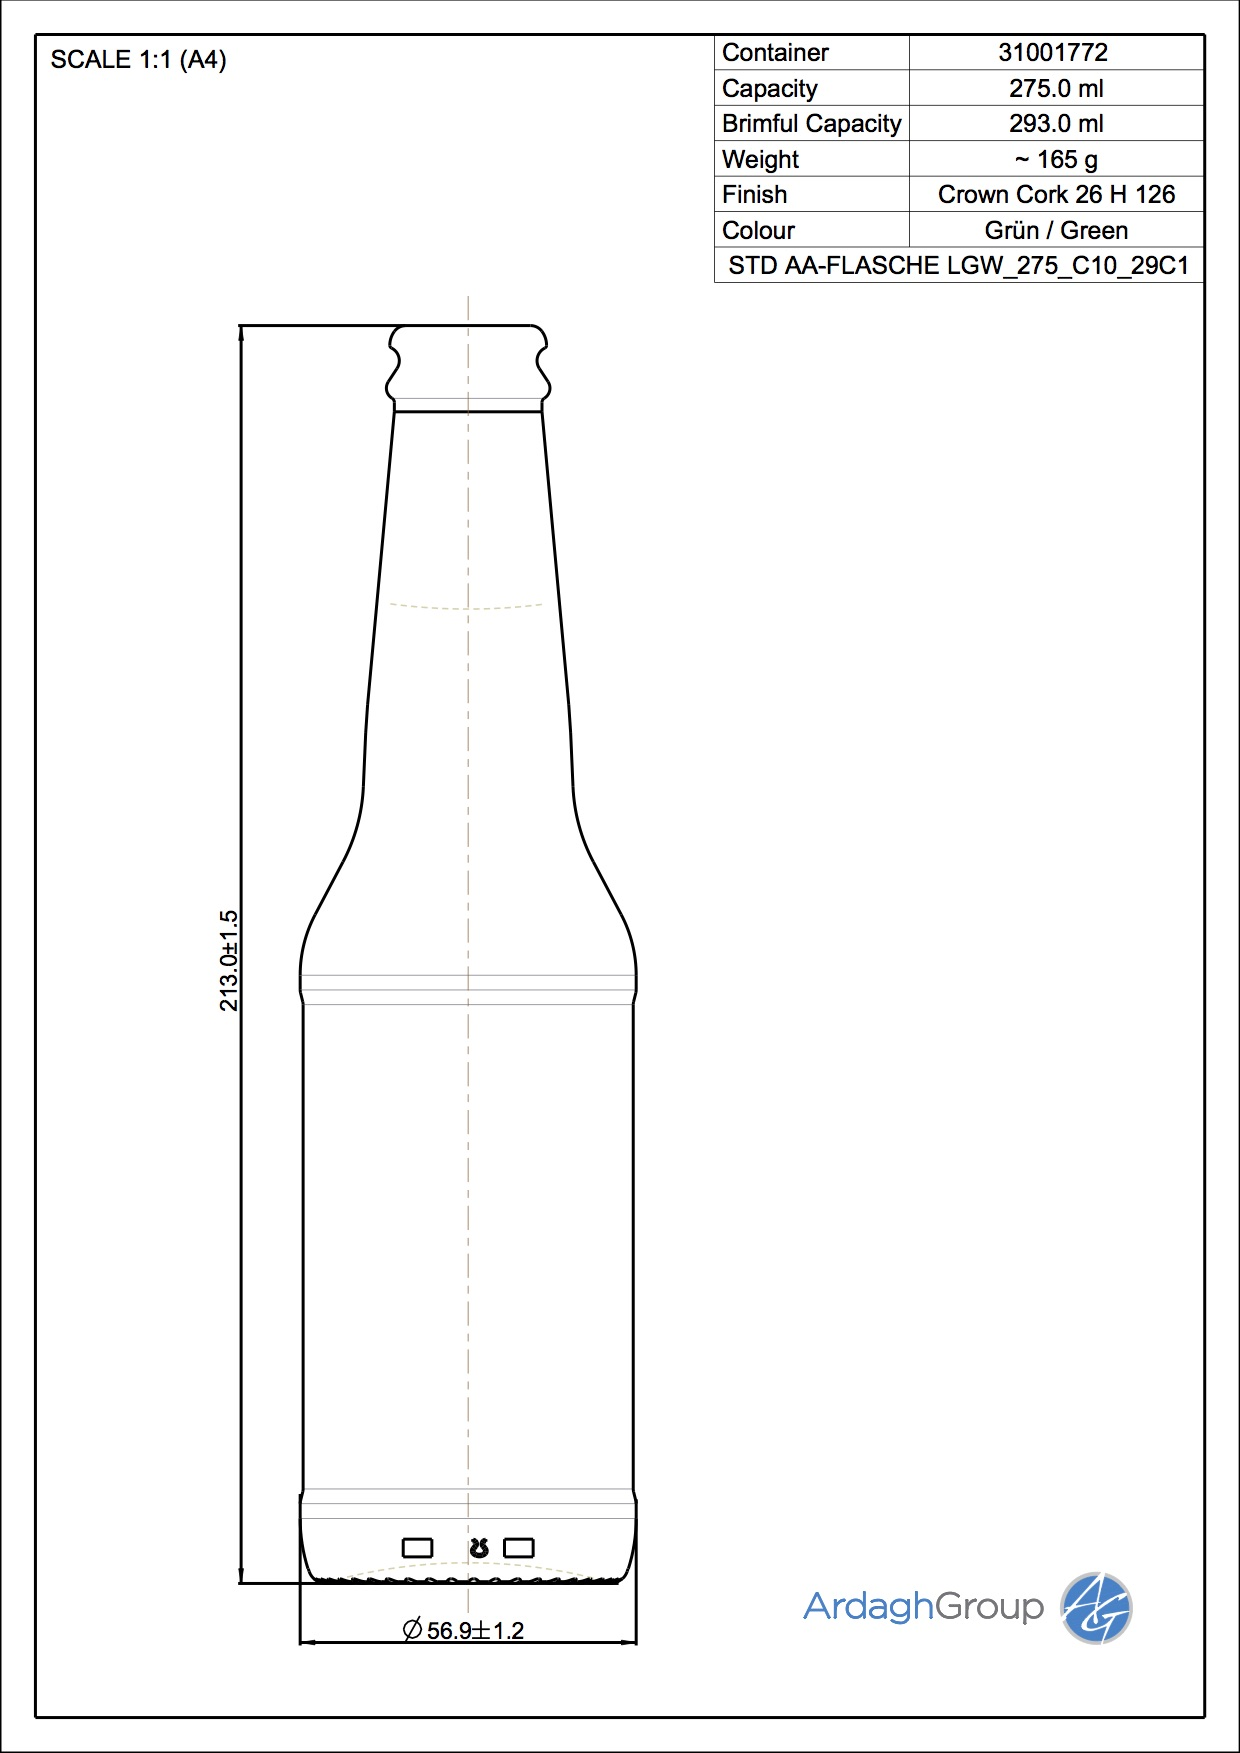 Std. AA Flasche LGW 275 C10 29C1